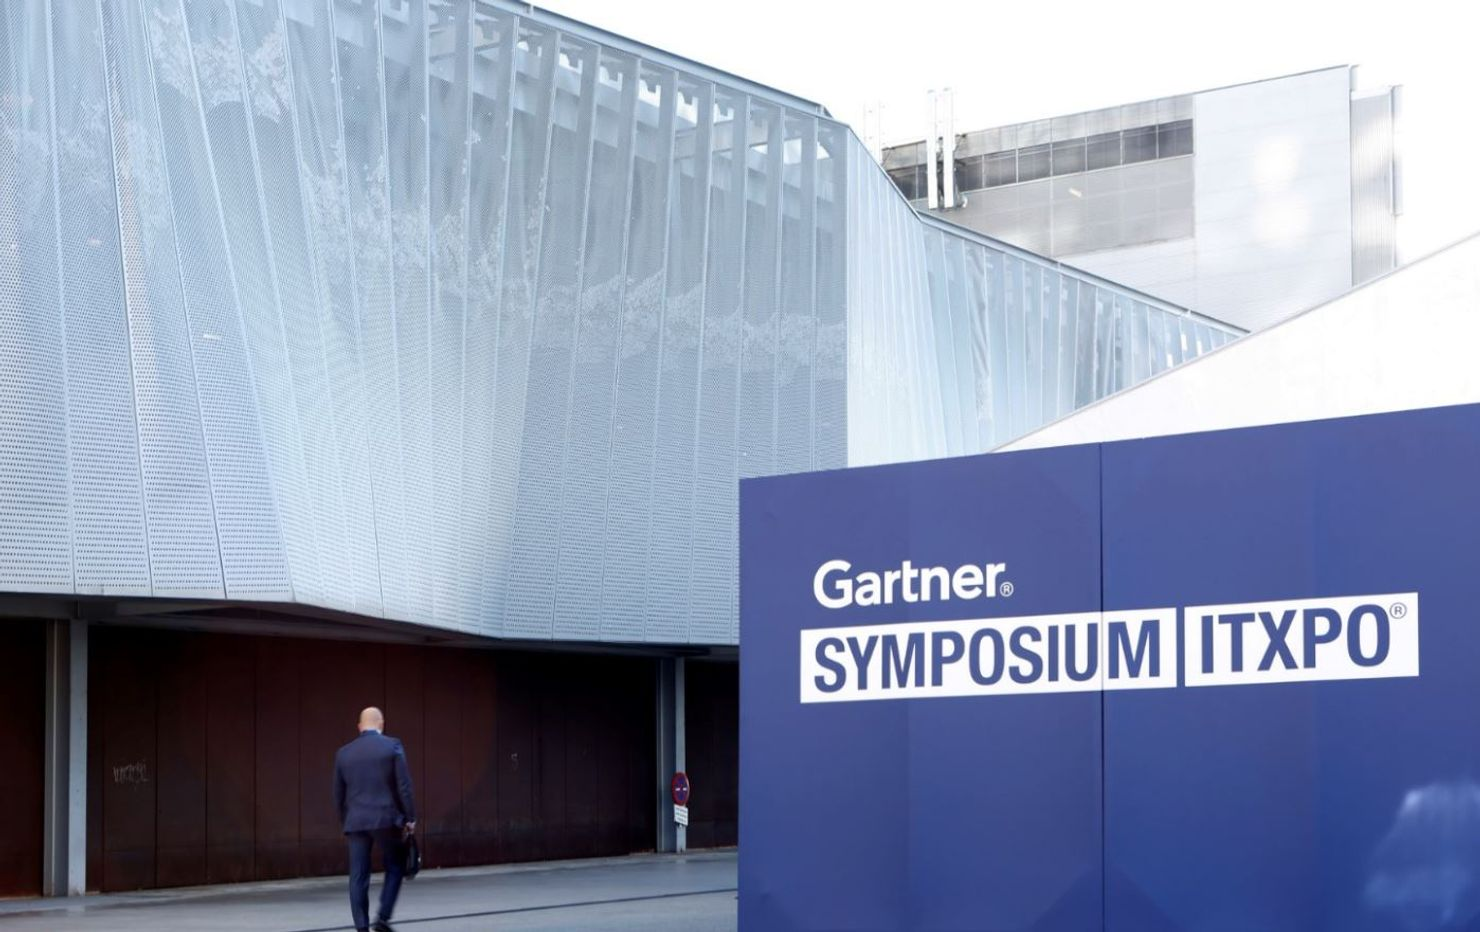 Image 1 for Gartner Symposium Orlando & Barcelona